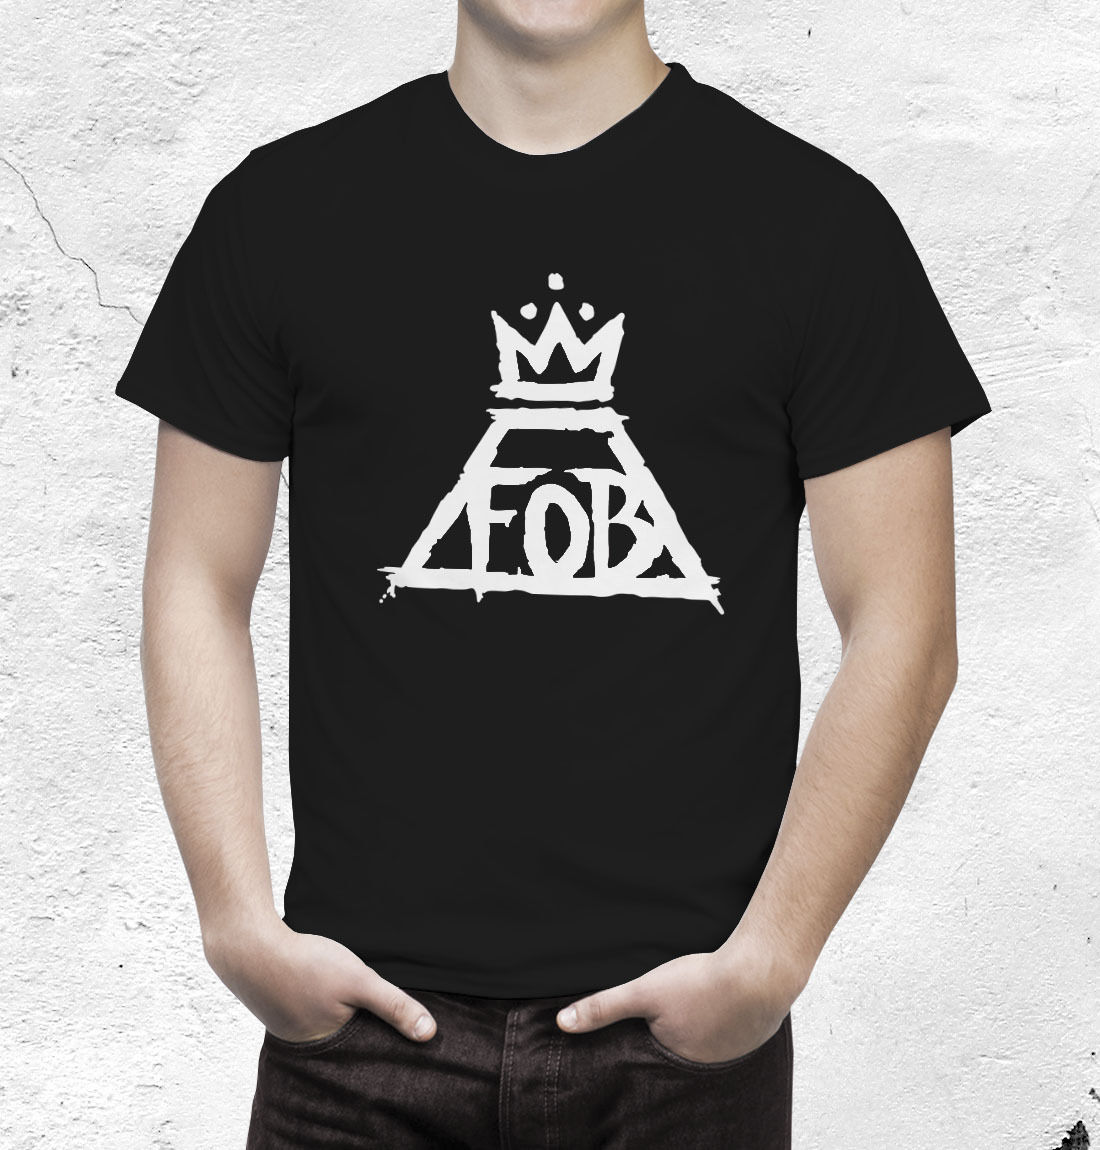 Fall Out Boy tshirt